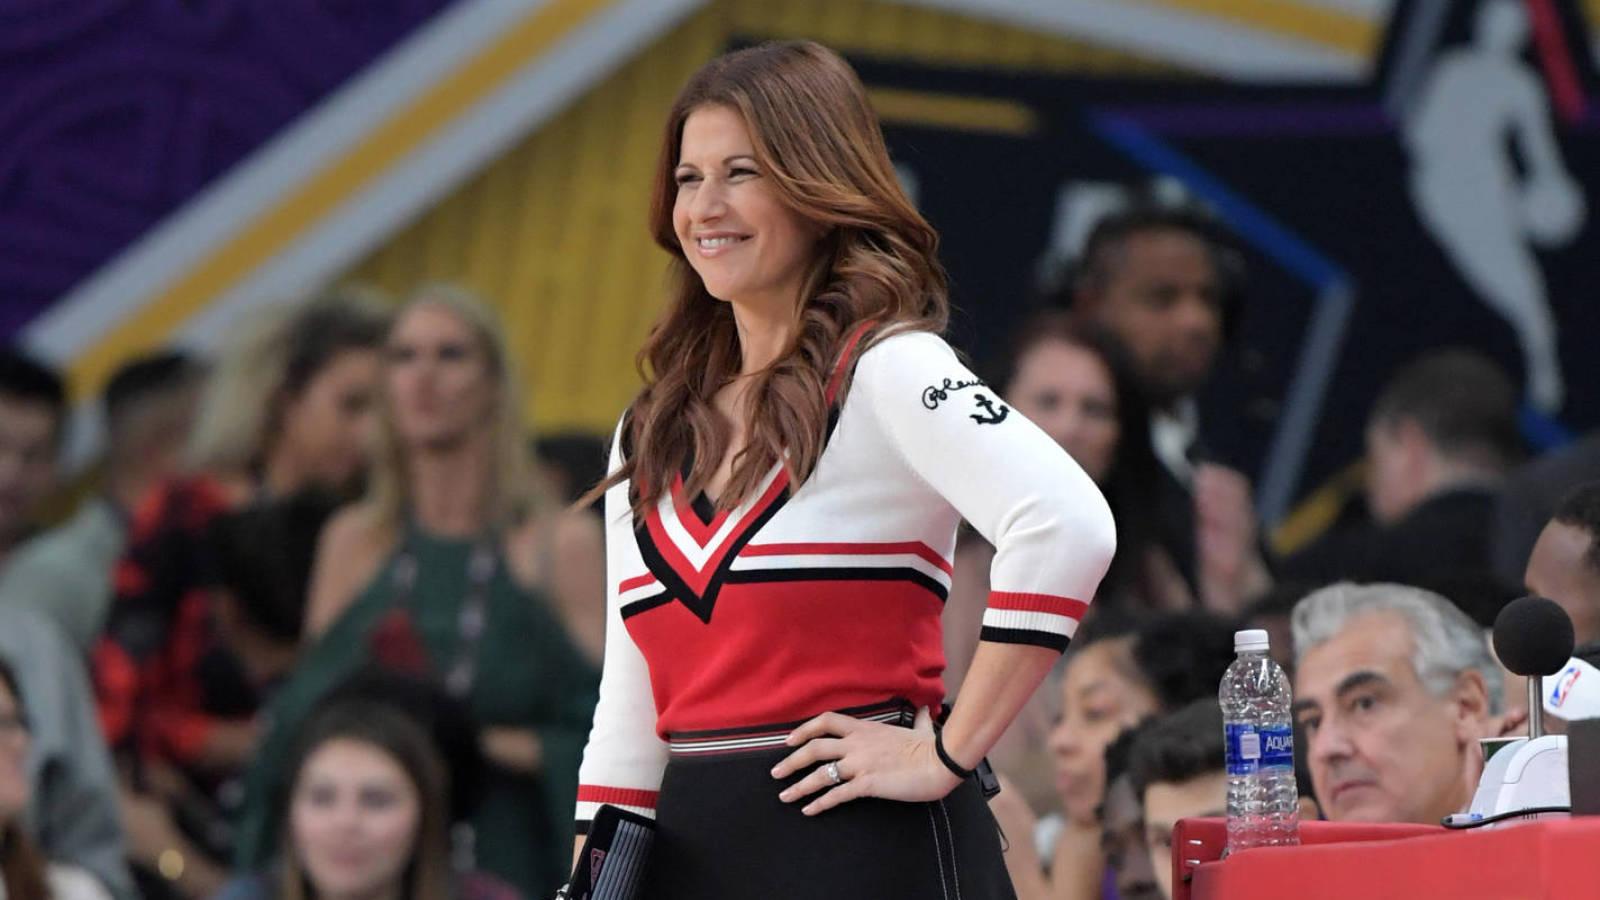 ESPN replaces Rachel Nichols with Malika Andrews for NBA Finals